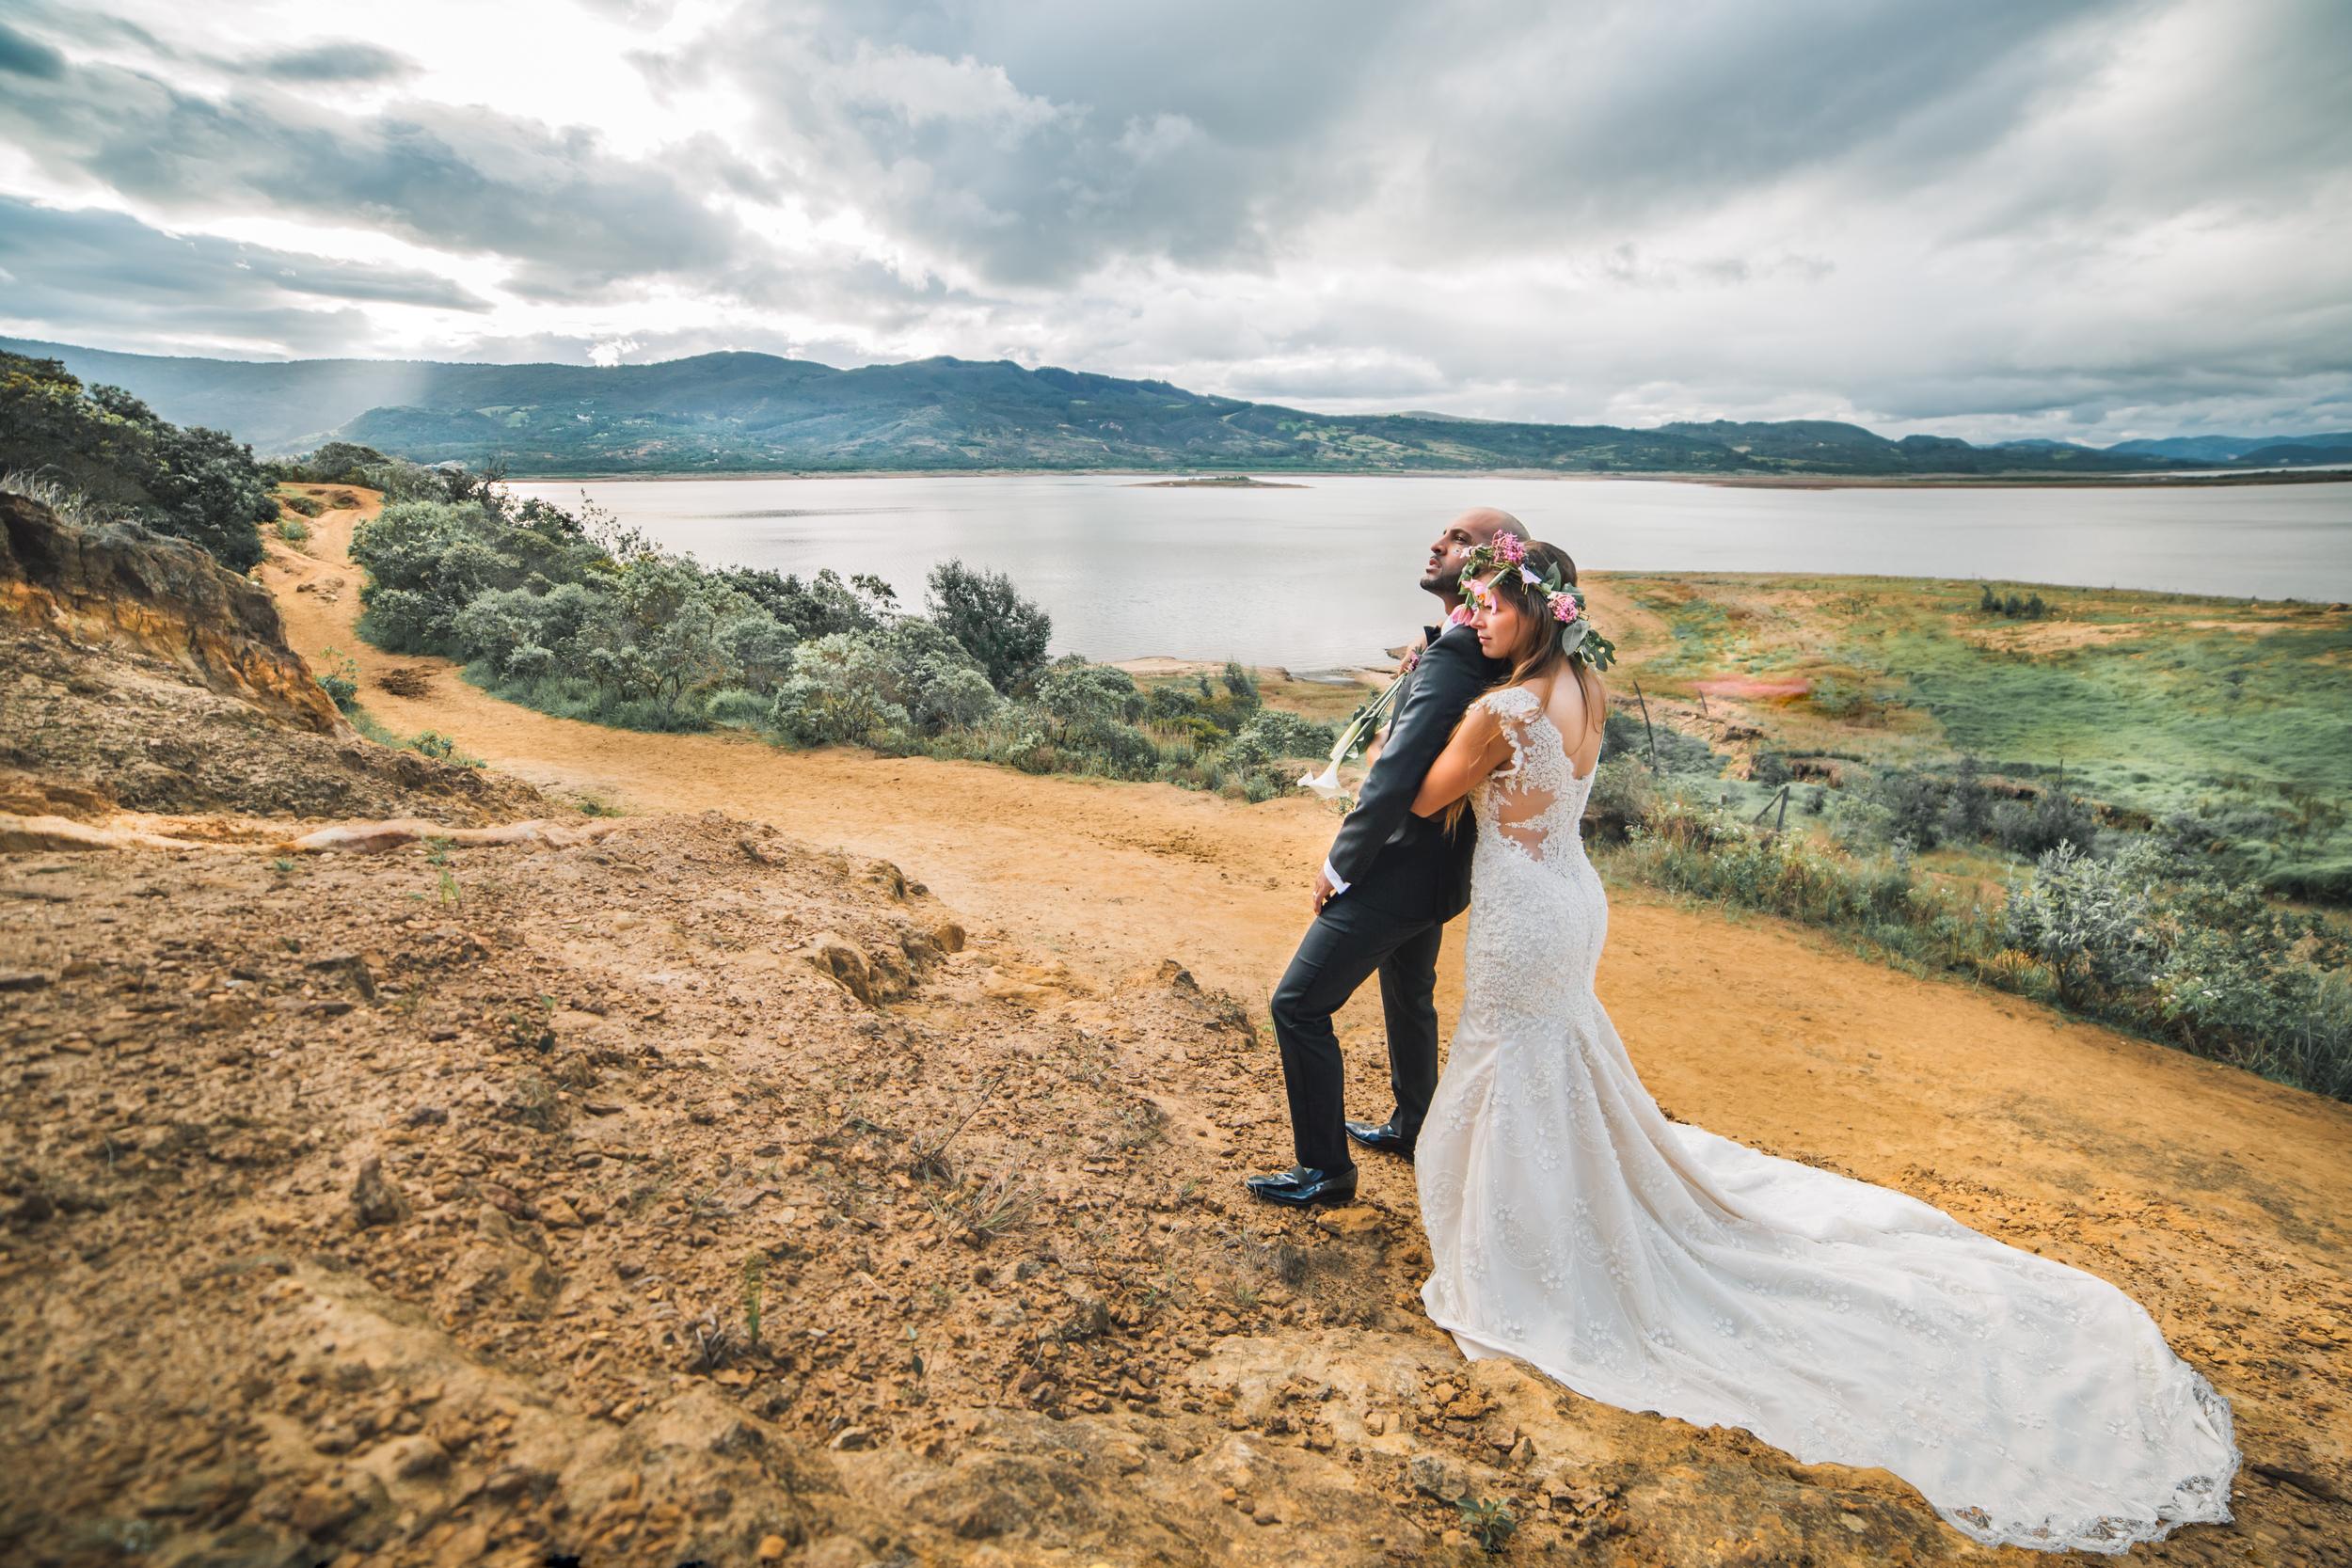 0. Bogota Destination Wedding Colombia Travel Kathryn & Nick June 2016 23.jpg